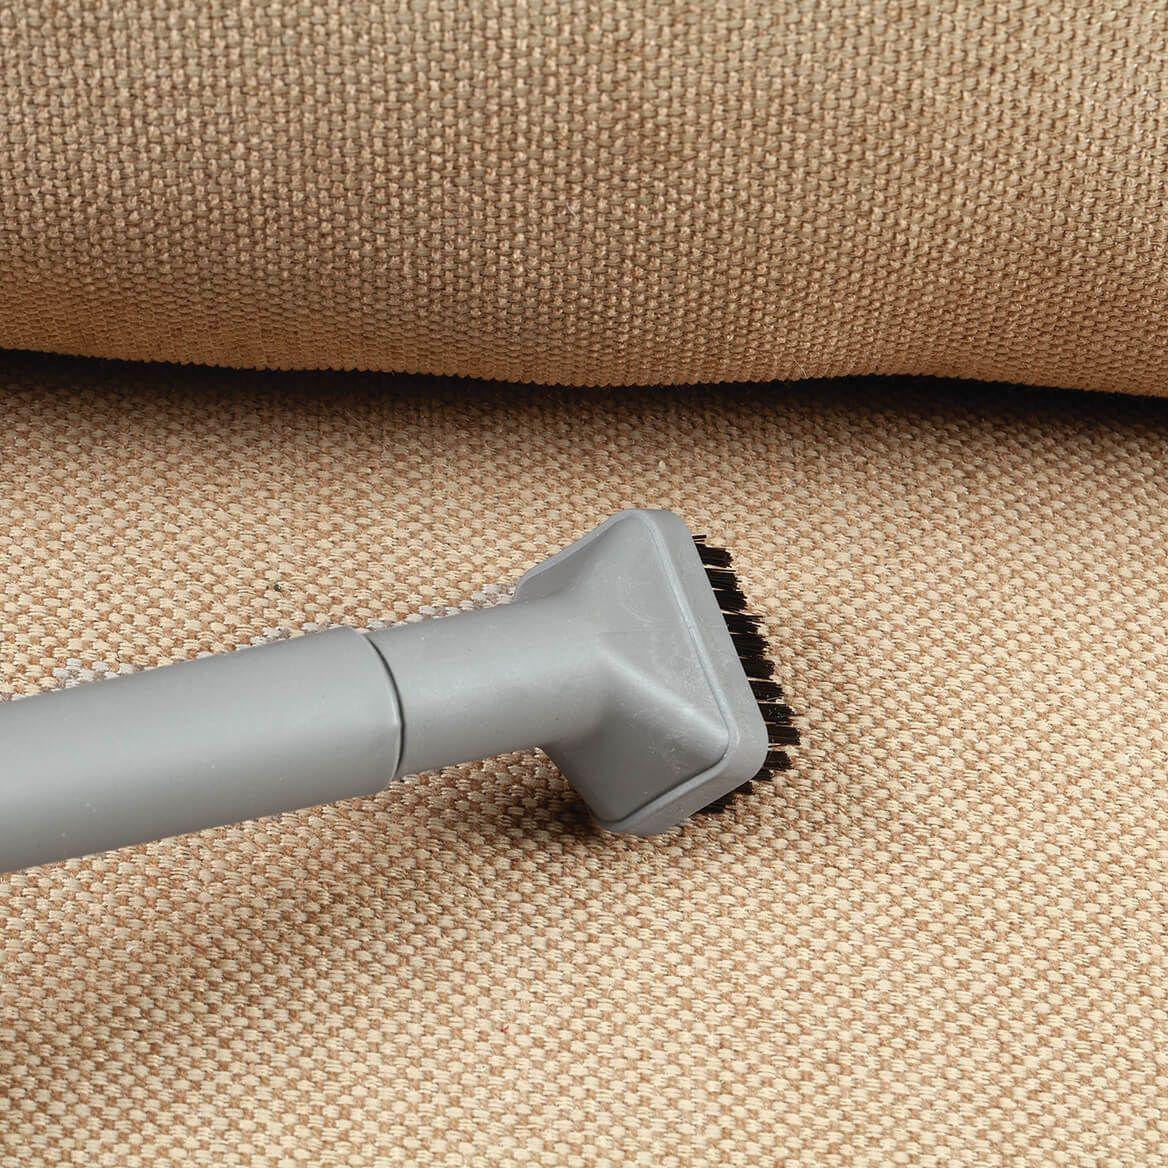 Mini Vacuum Attachments, 9-Piece Set-371832